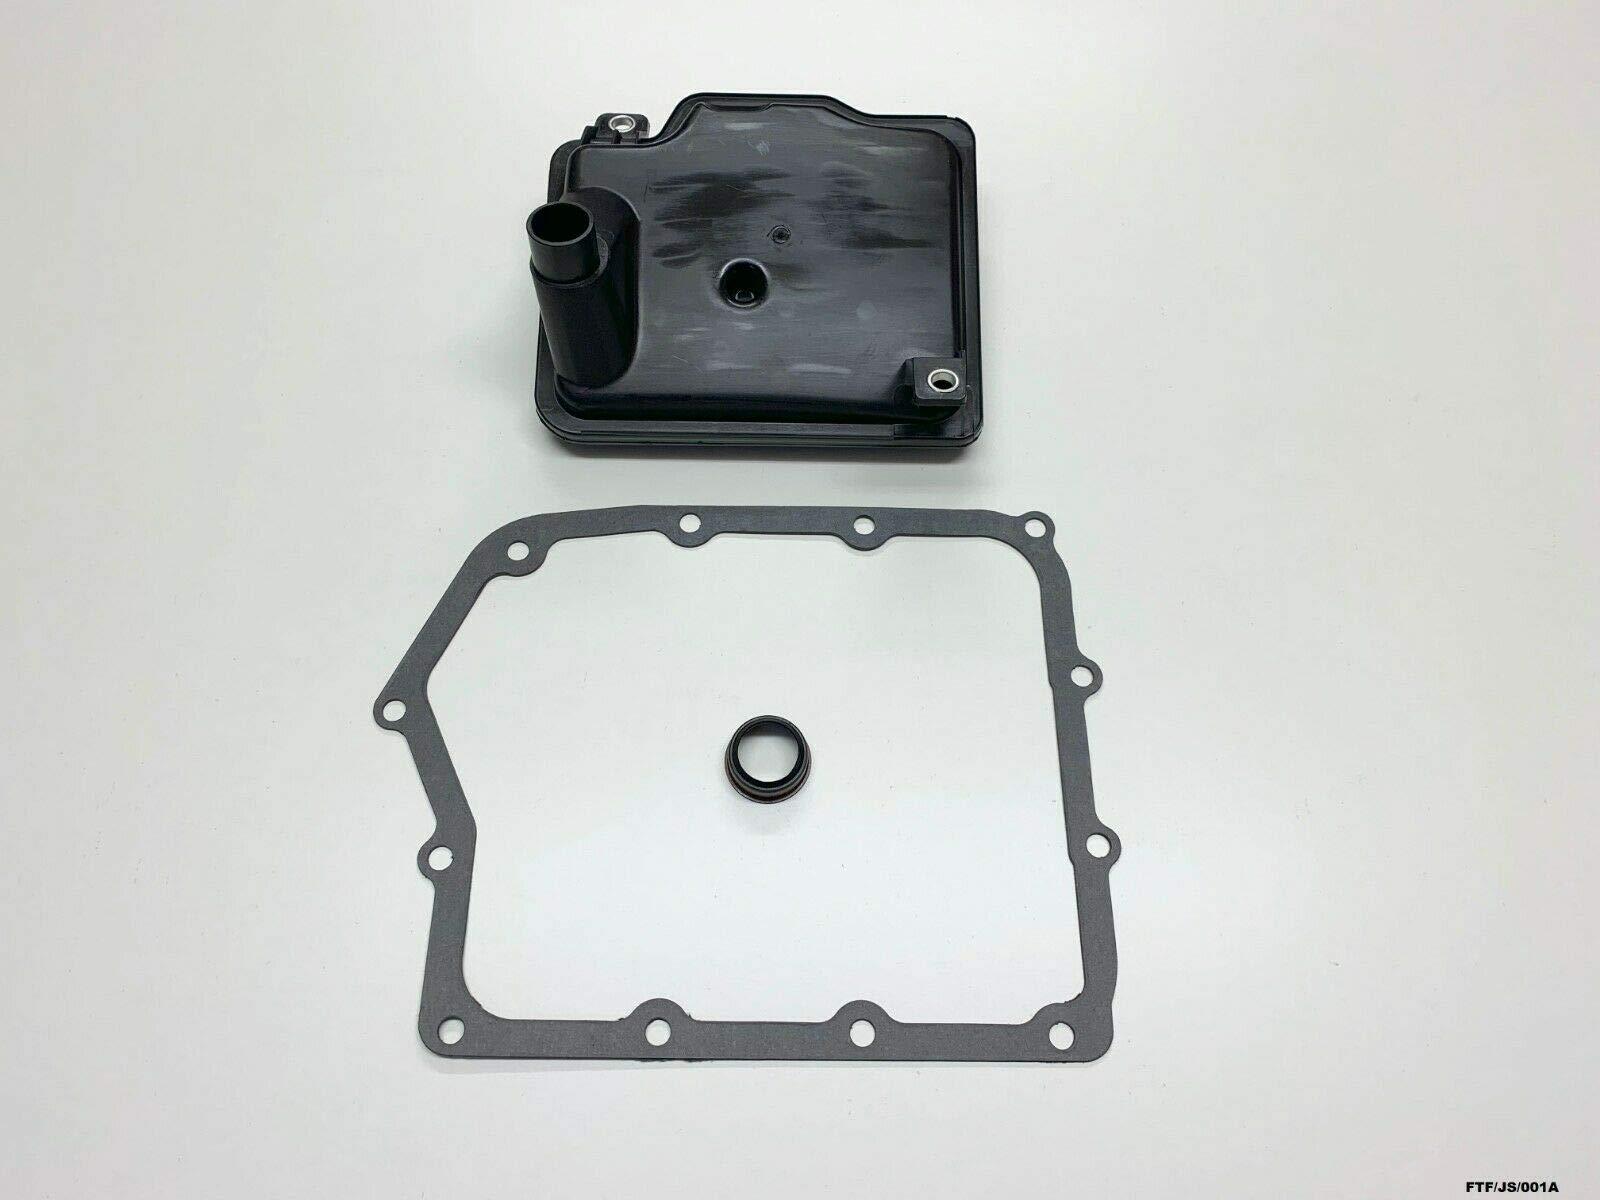 BTS Throttle Body Compass /& Patriot 2.0L /& 2.4 2007-2017// Caliber 2.0L /& 2.4L 2007-2012// Journey 2.4 2009-2017// Sebring//Avenger 2.0L /& 2.4L 2007-2014